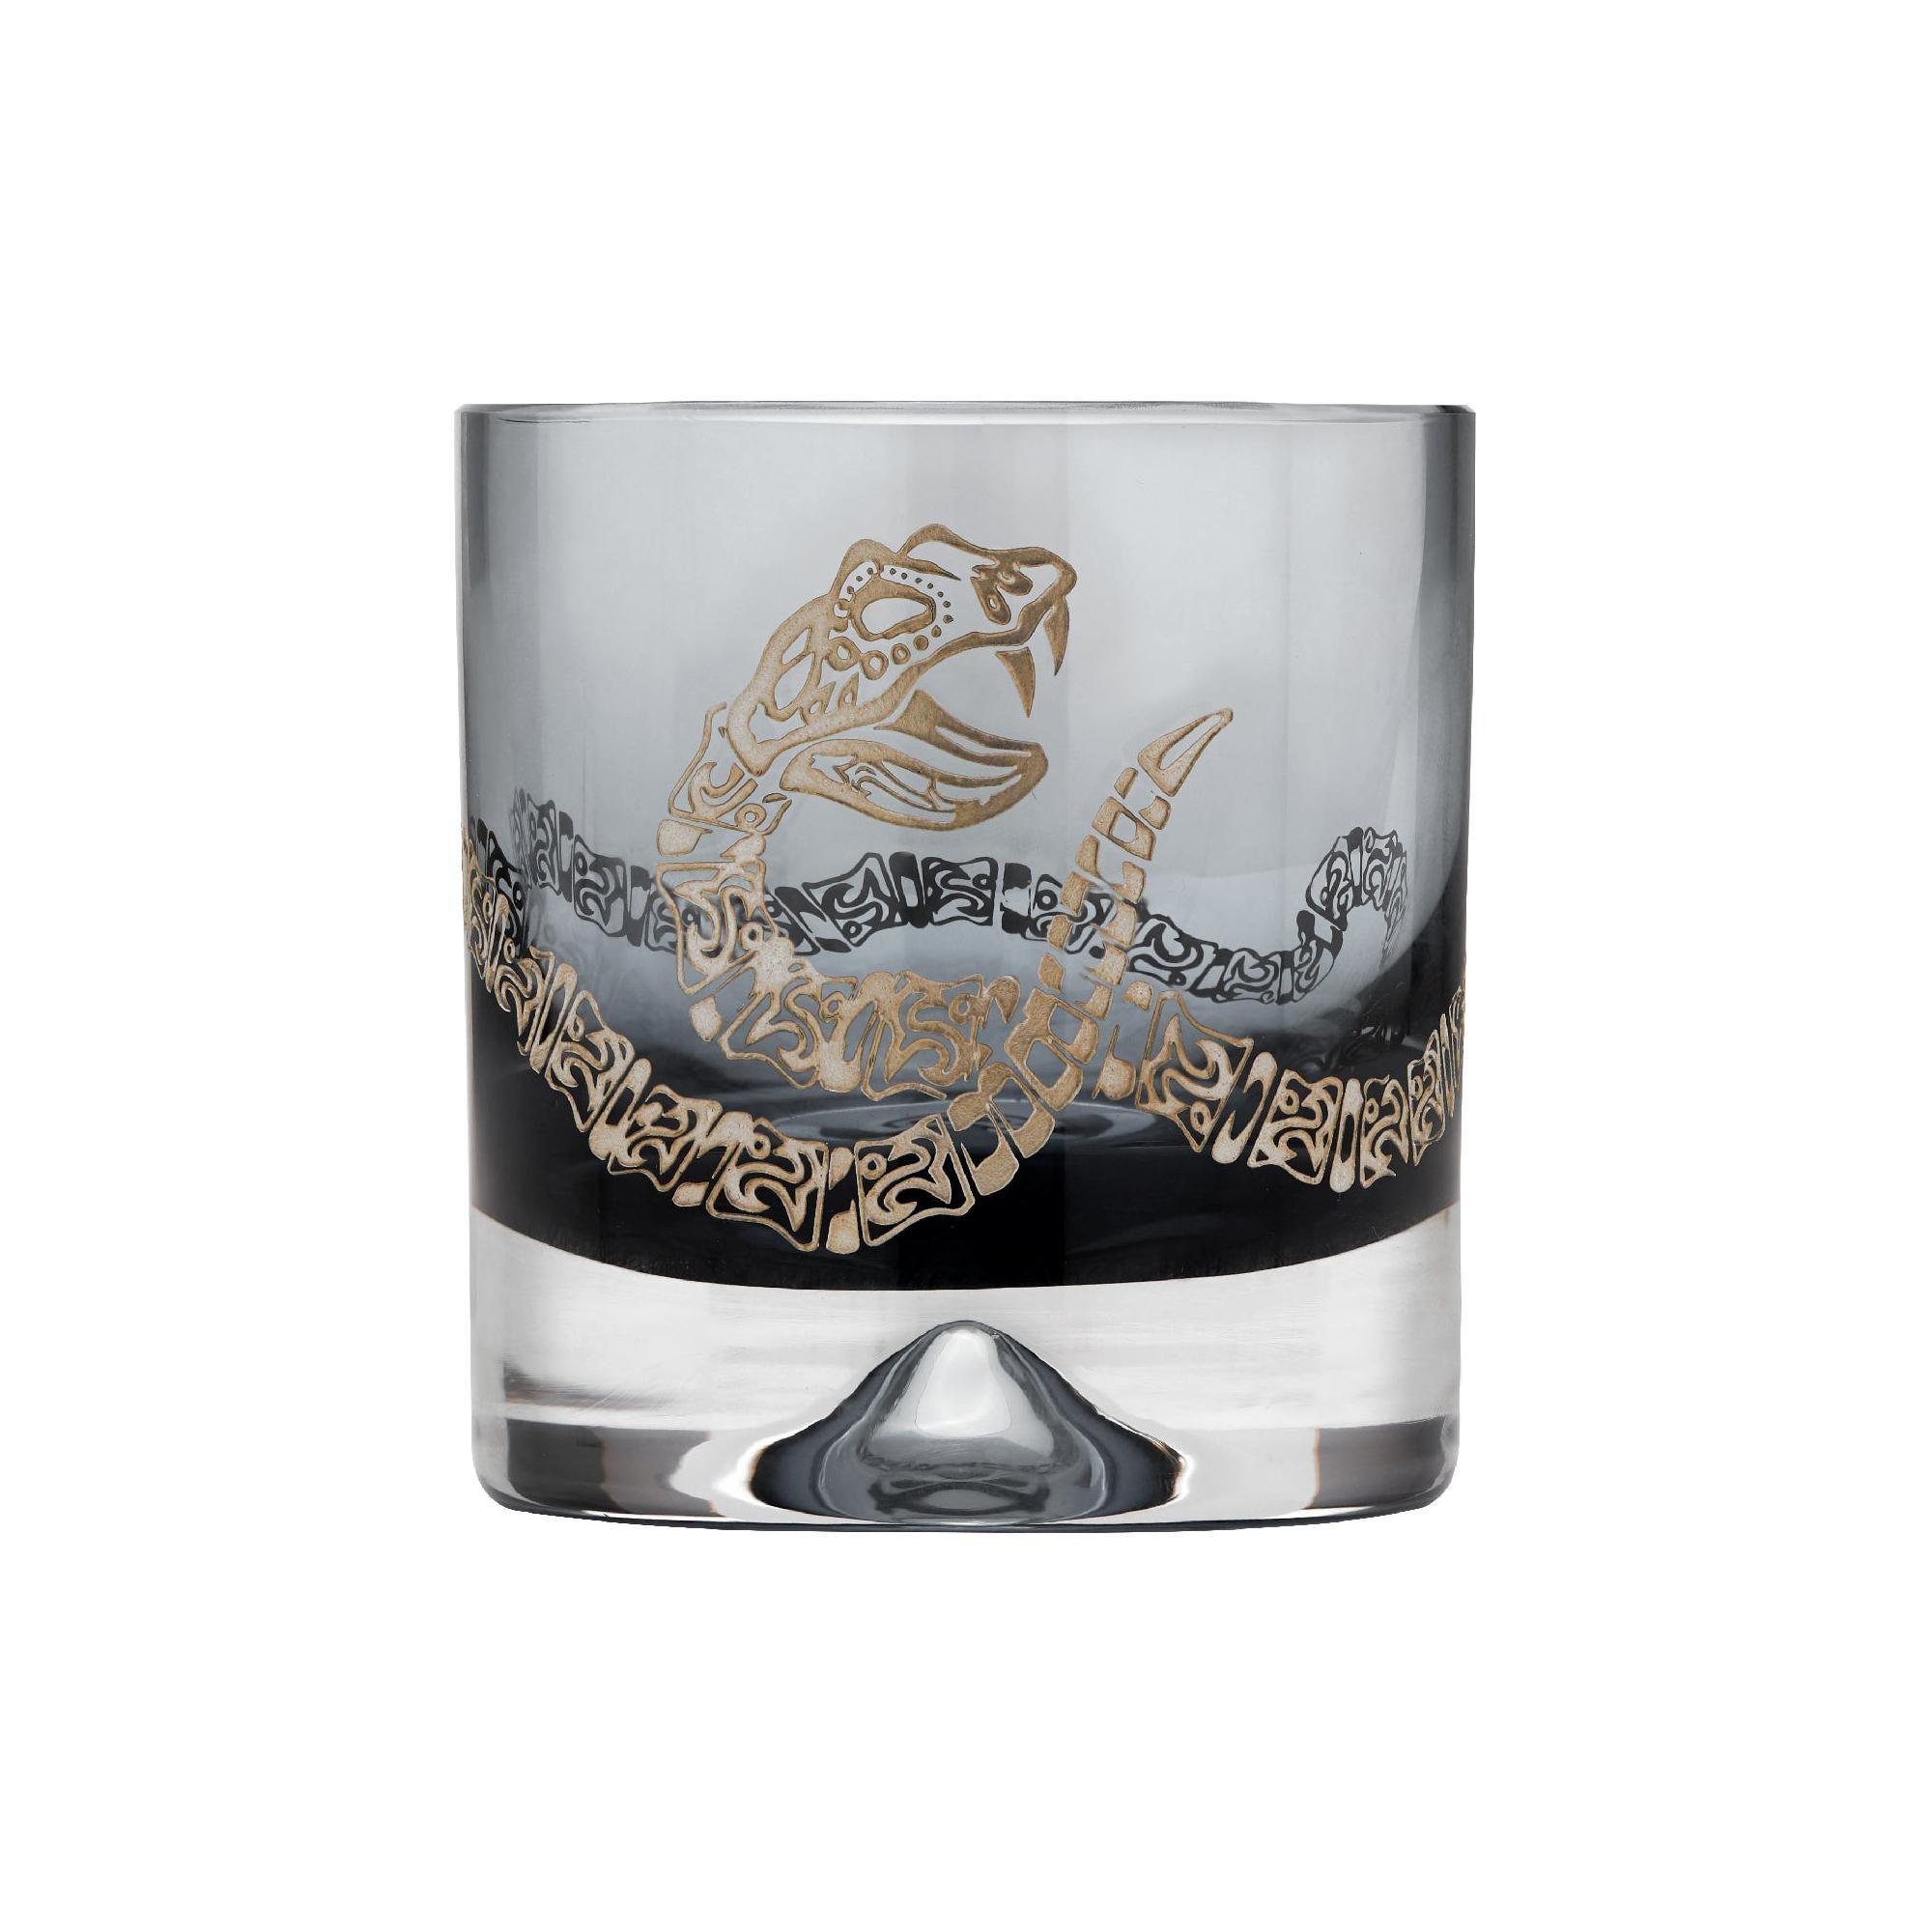 Stephen Webster Tequila Lore Rattlesnake Engraved Smoke Tumbler - Set of 2